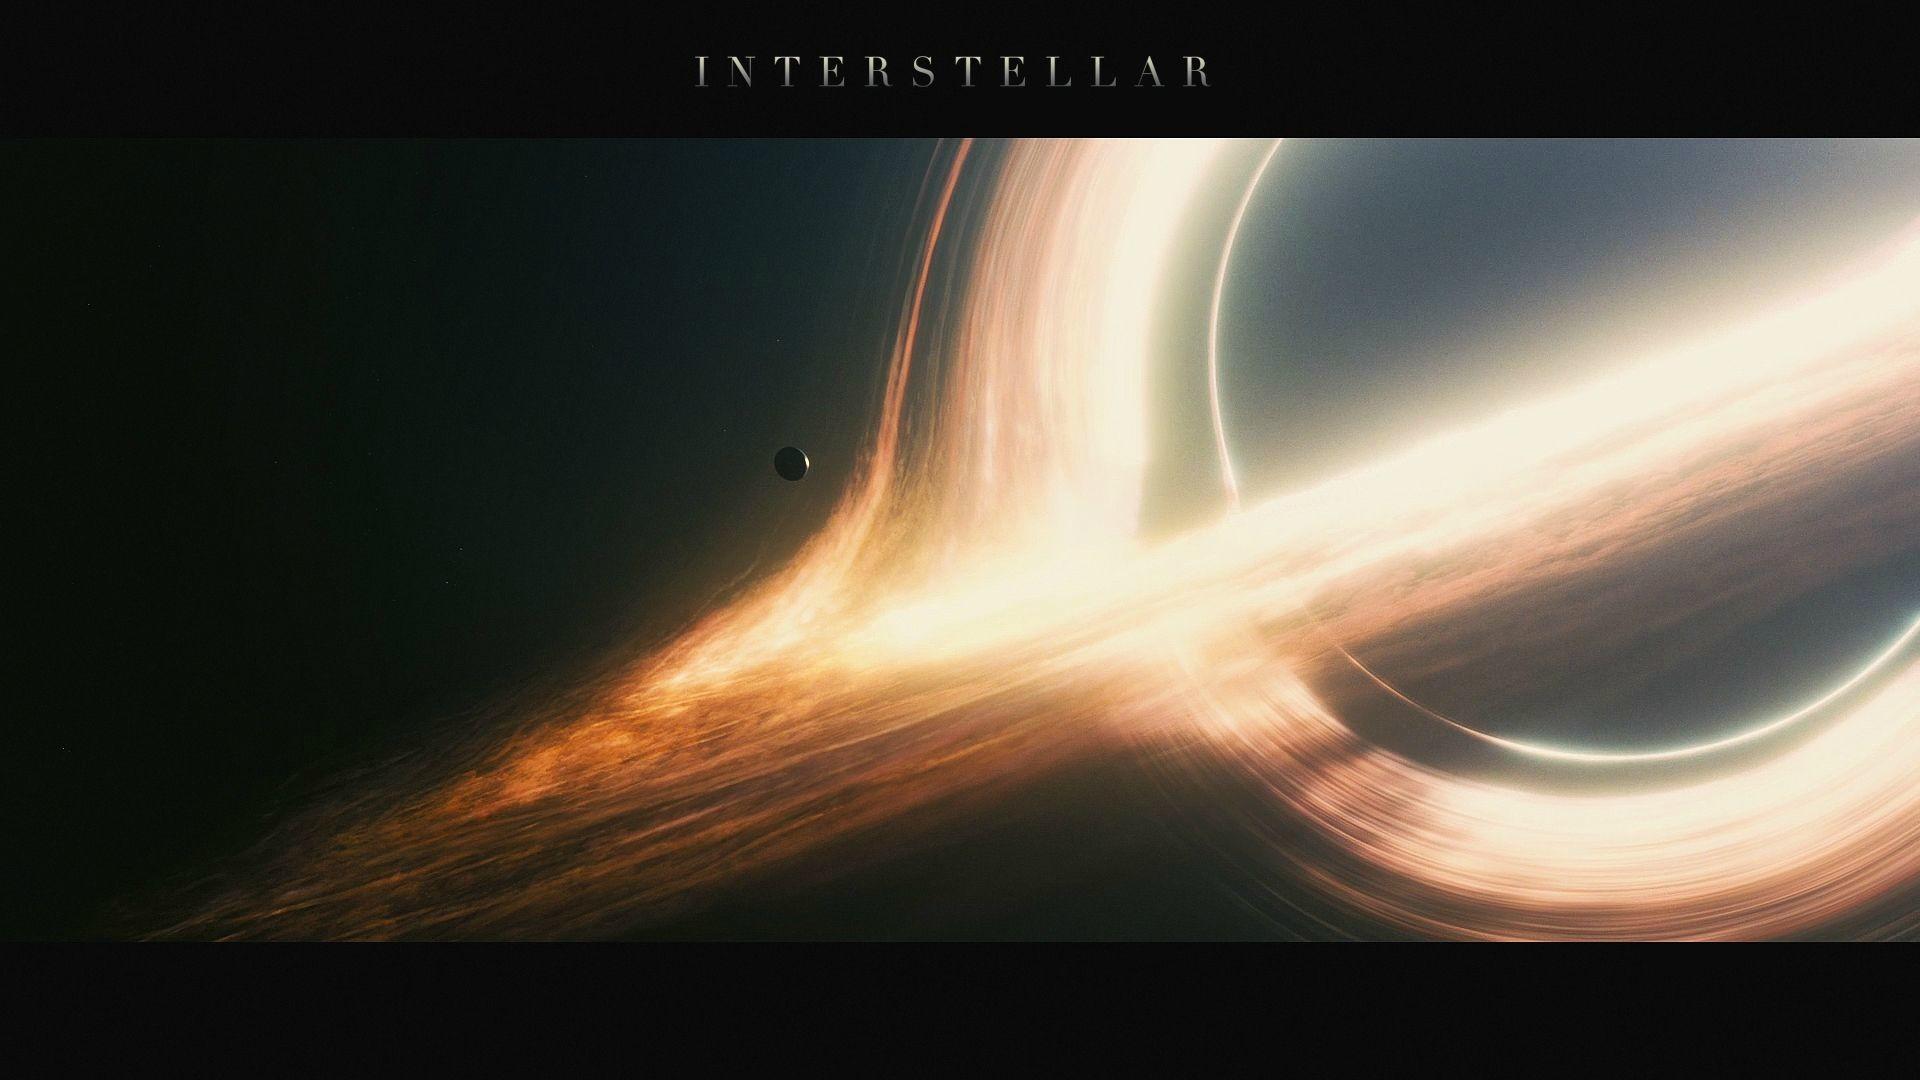 Gargantua Interstellar Black Hole Wallpaper HD – Pics about space